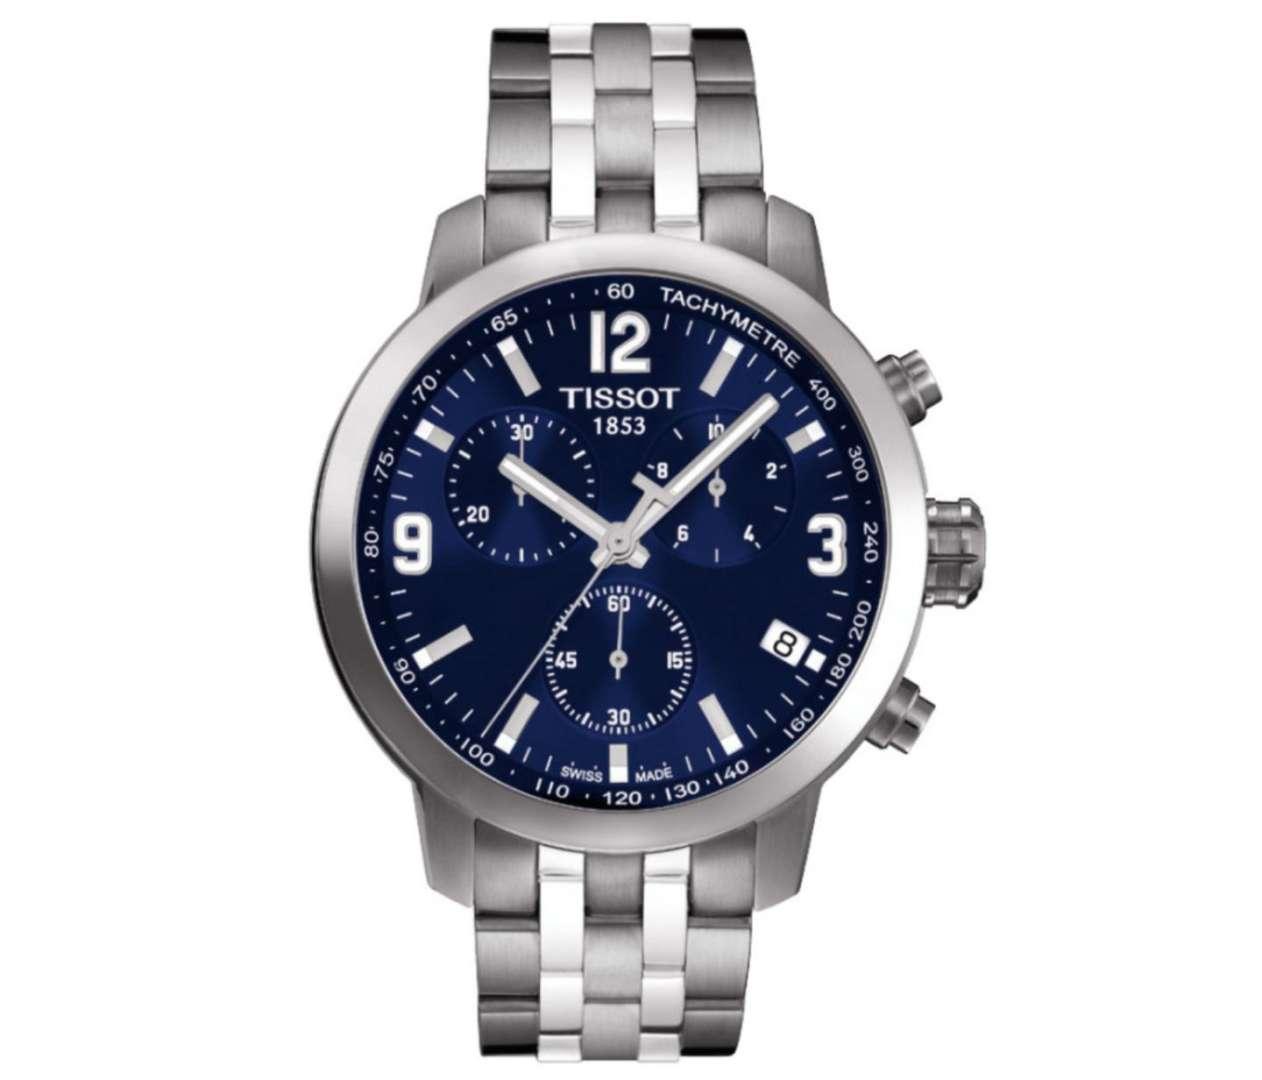 שעון יד אנלוגי tissot t055.417.11.047.00 טיסו